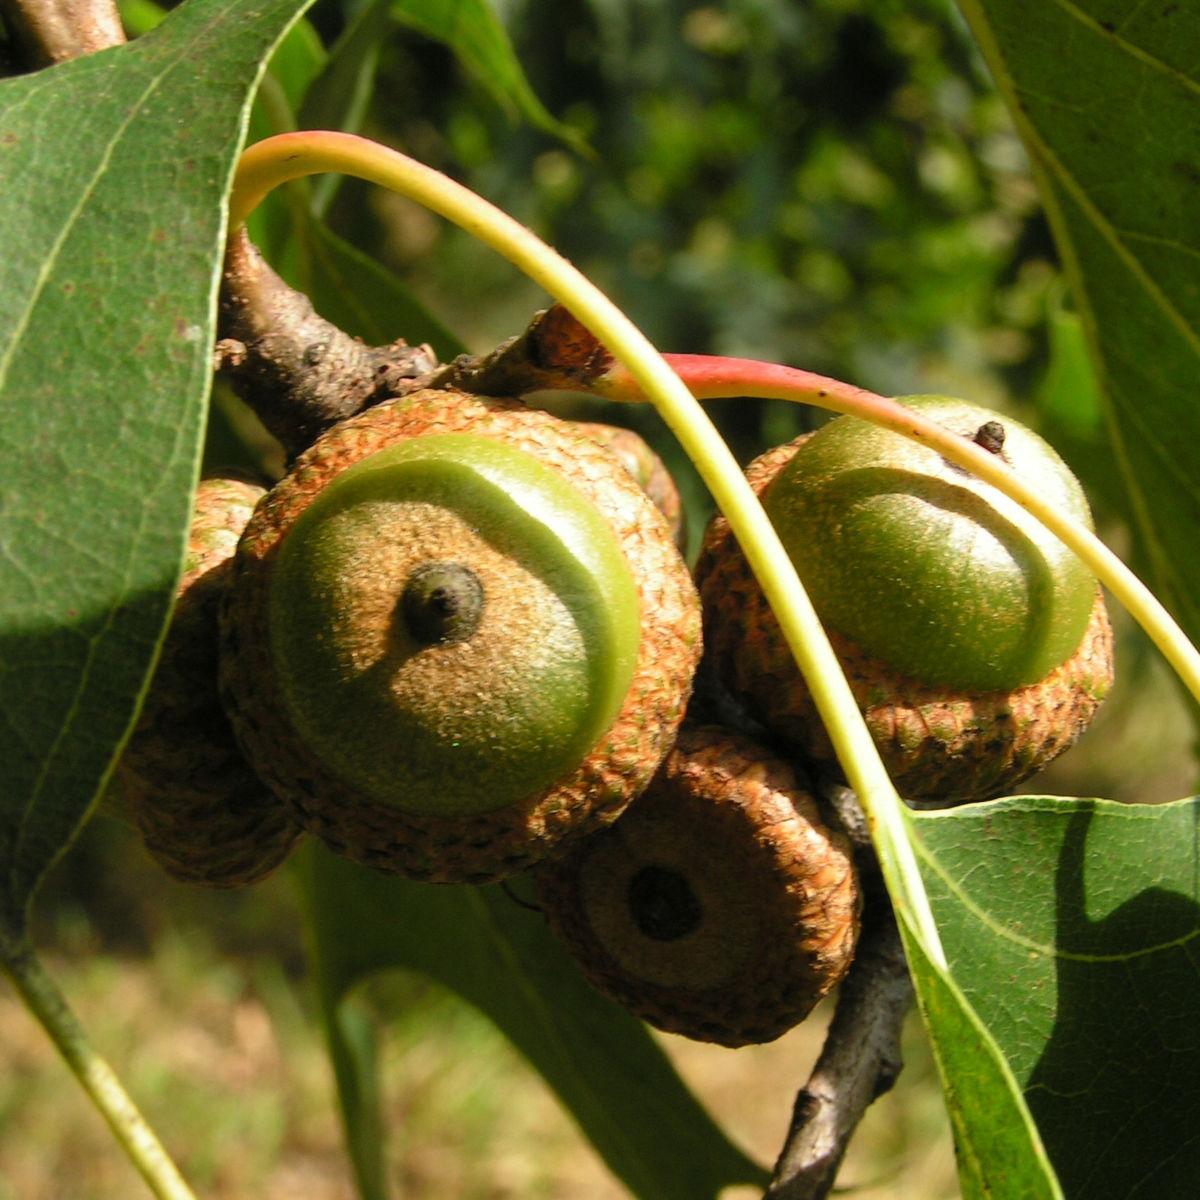 Eiche Baum Frucht Eichel Quercus x richteri